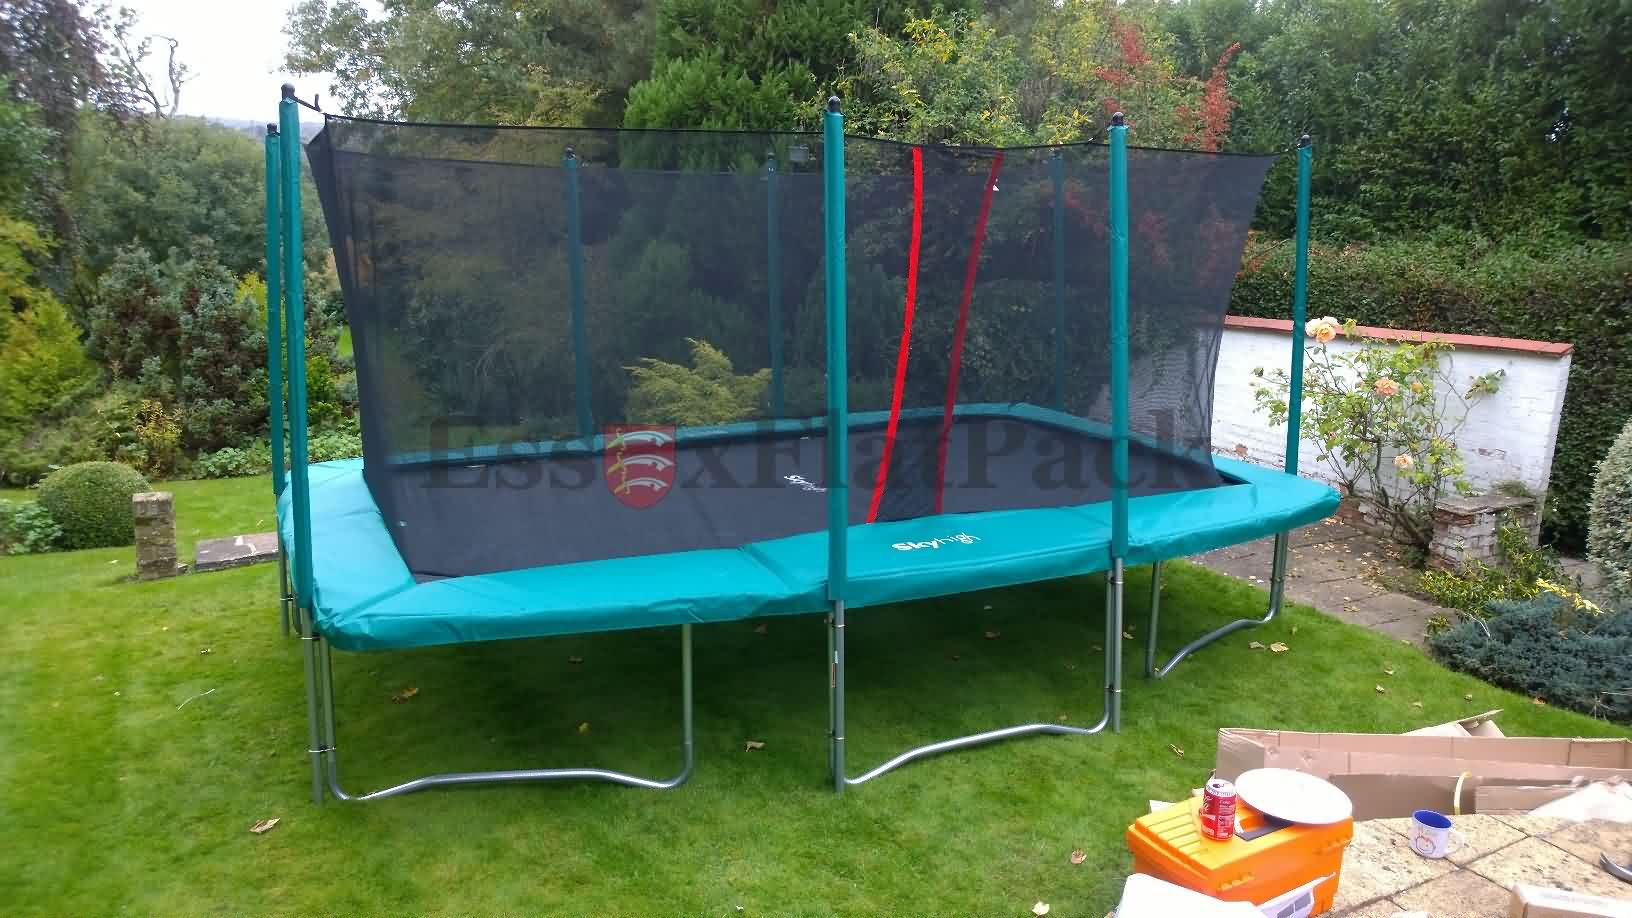 essexflatpack-trampolines-20151017154031.jpg